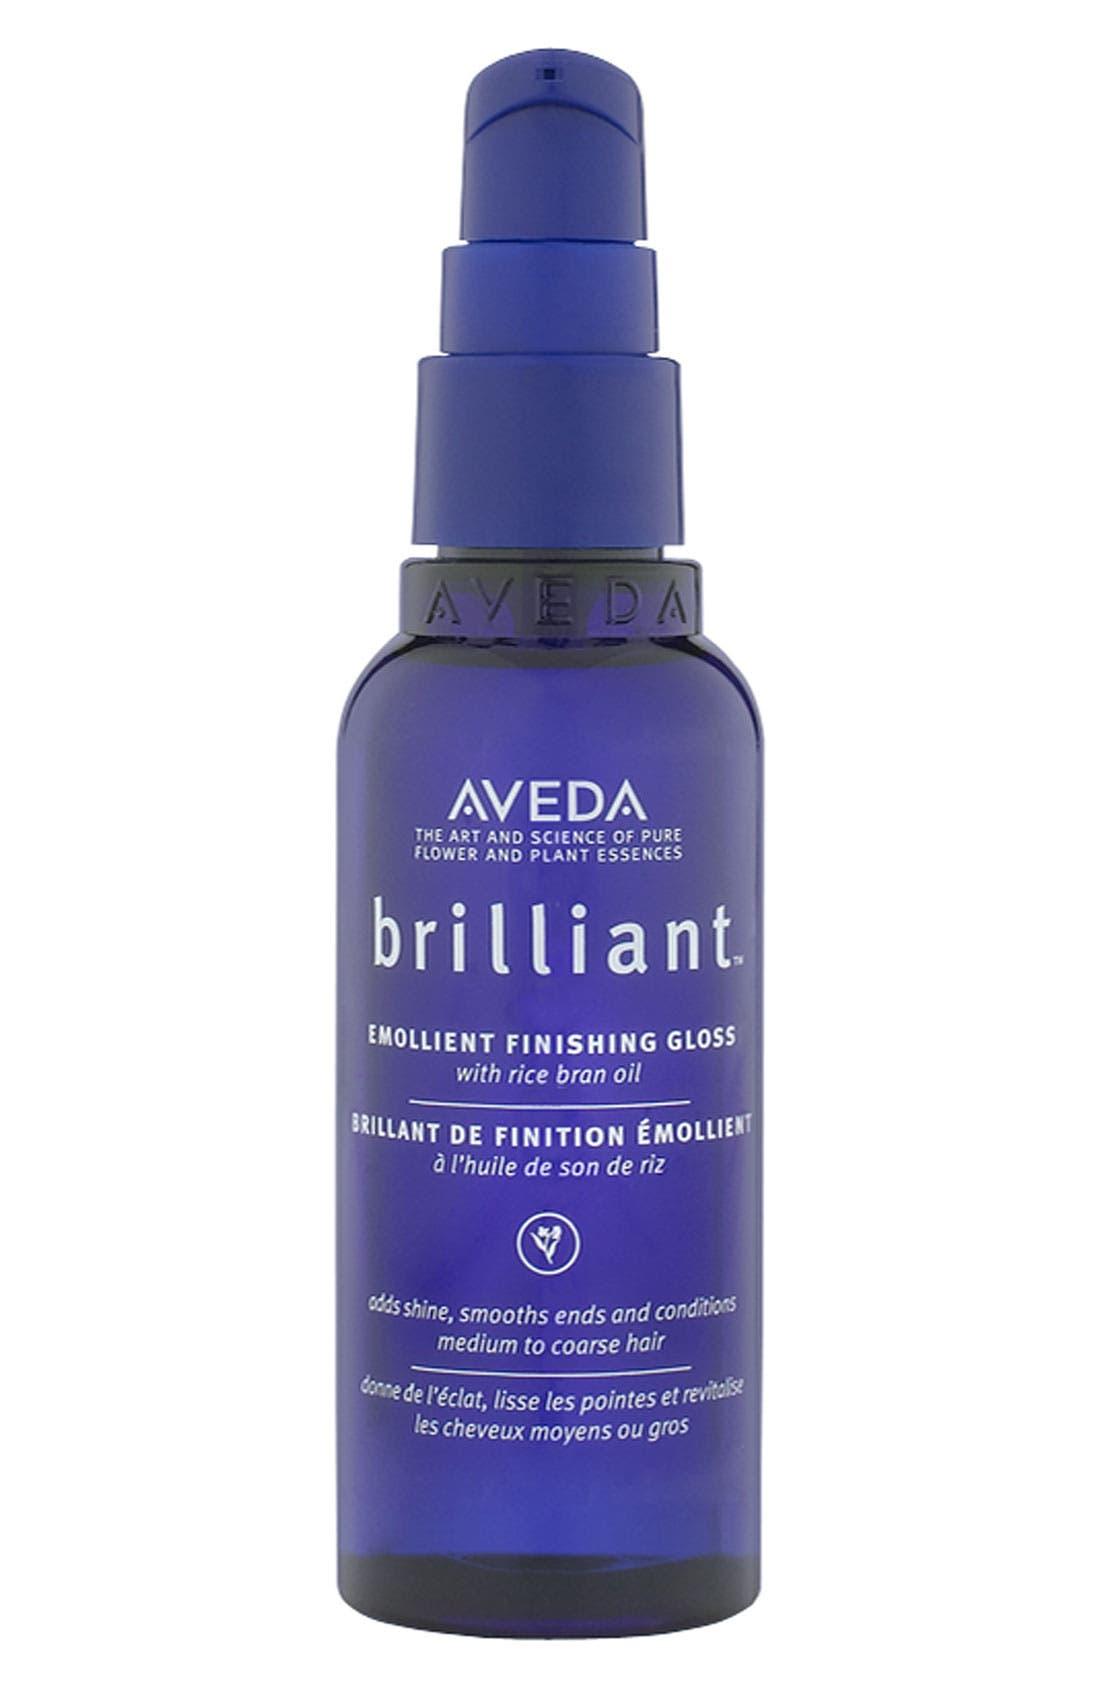 Aveda brilliant™ Emollient Finishing Gloss